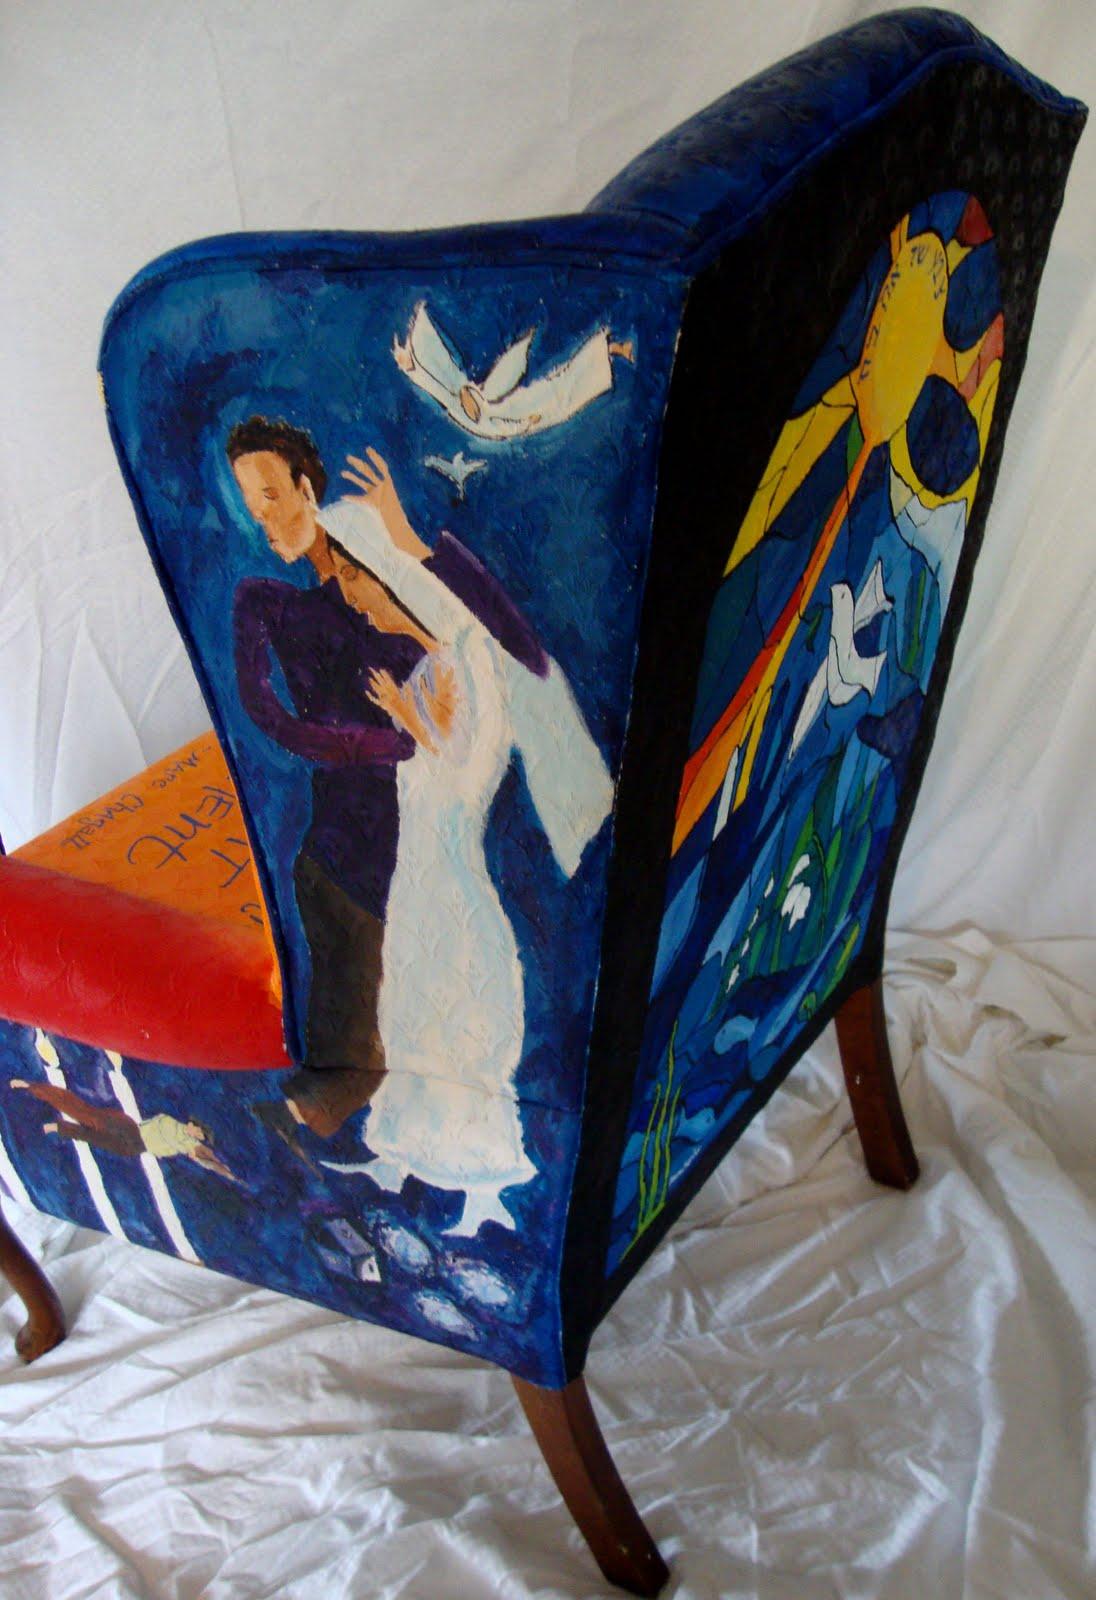 Chagall%252BChair%252BSide%252BBride%252B%25252526%252Bback Sex World